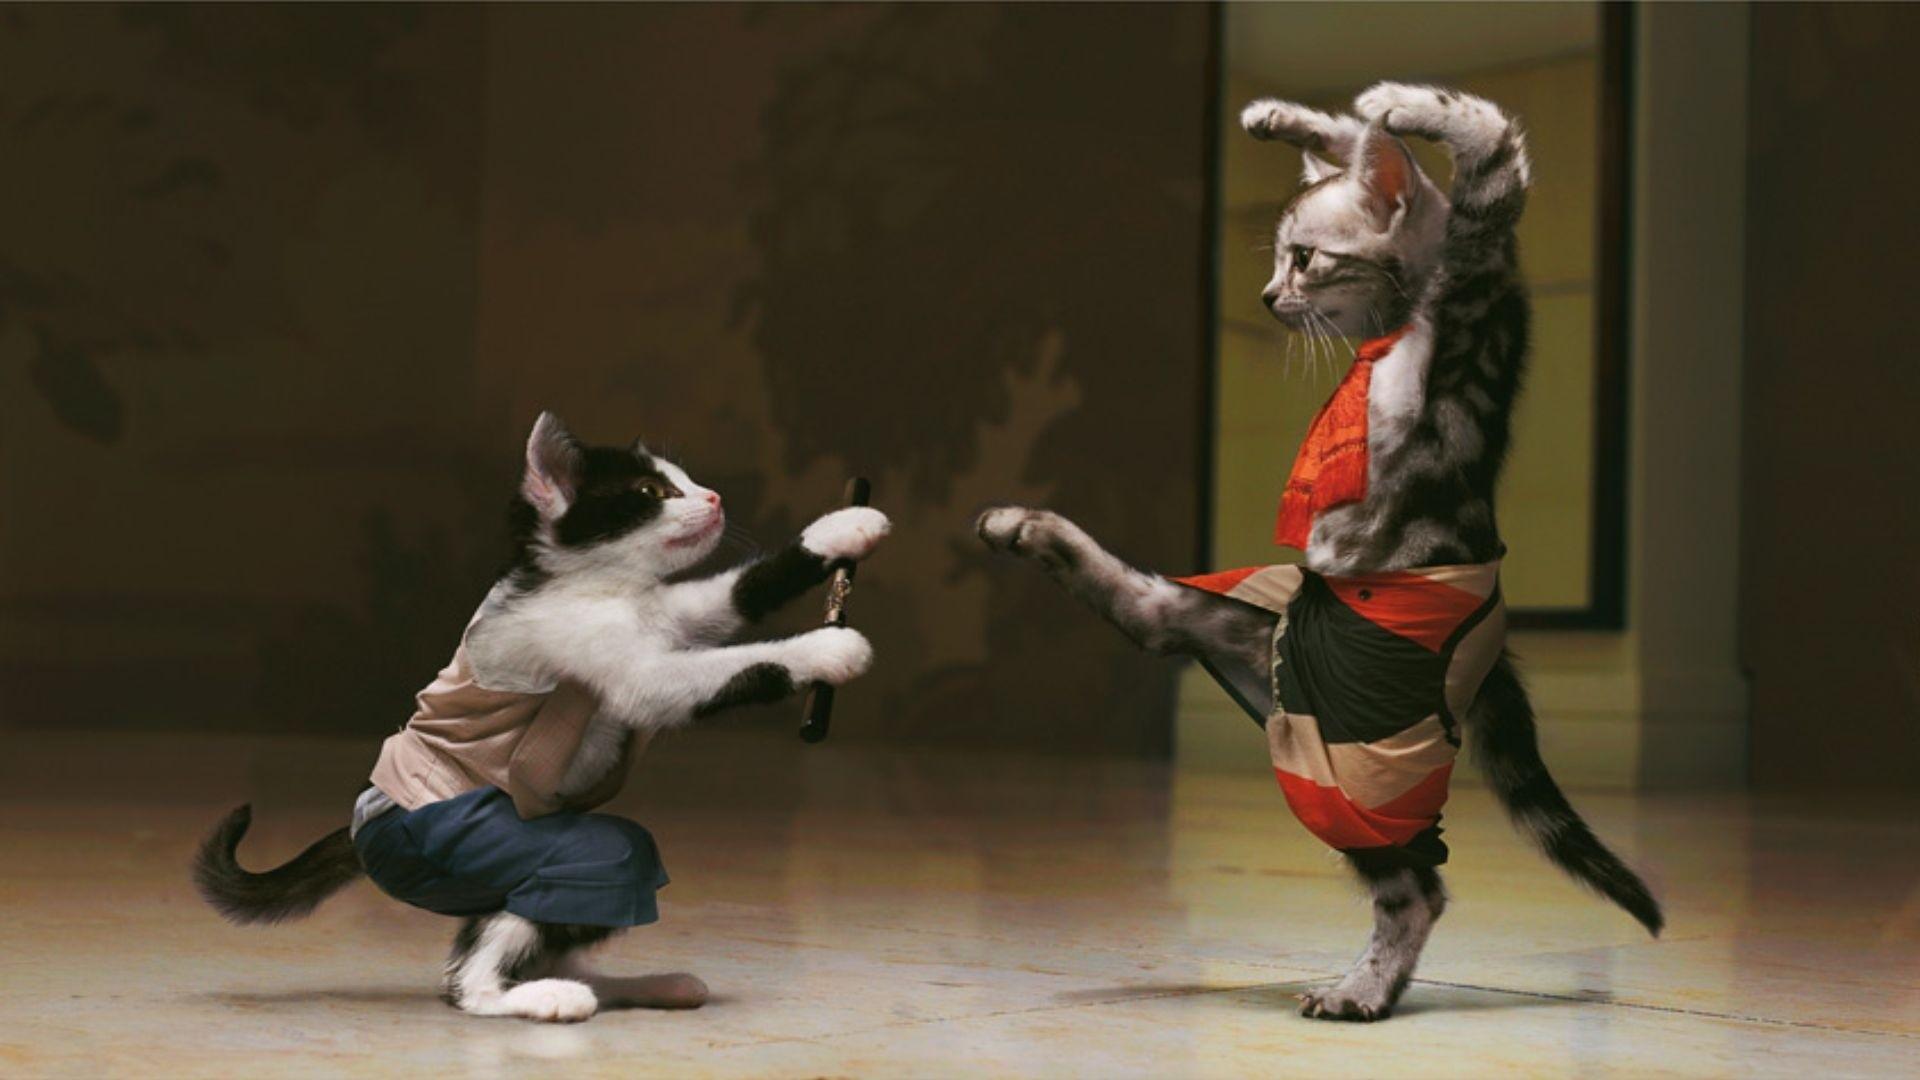 Gatos practicando Kung Fu - 1920x1080